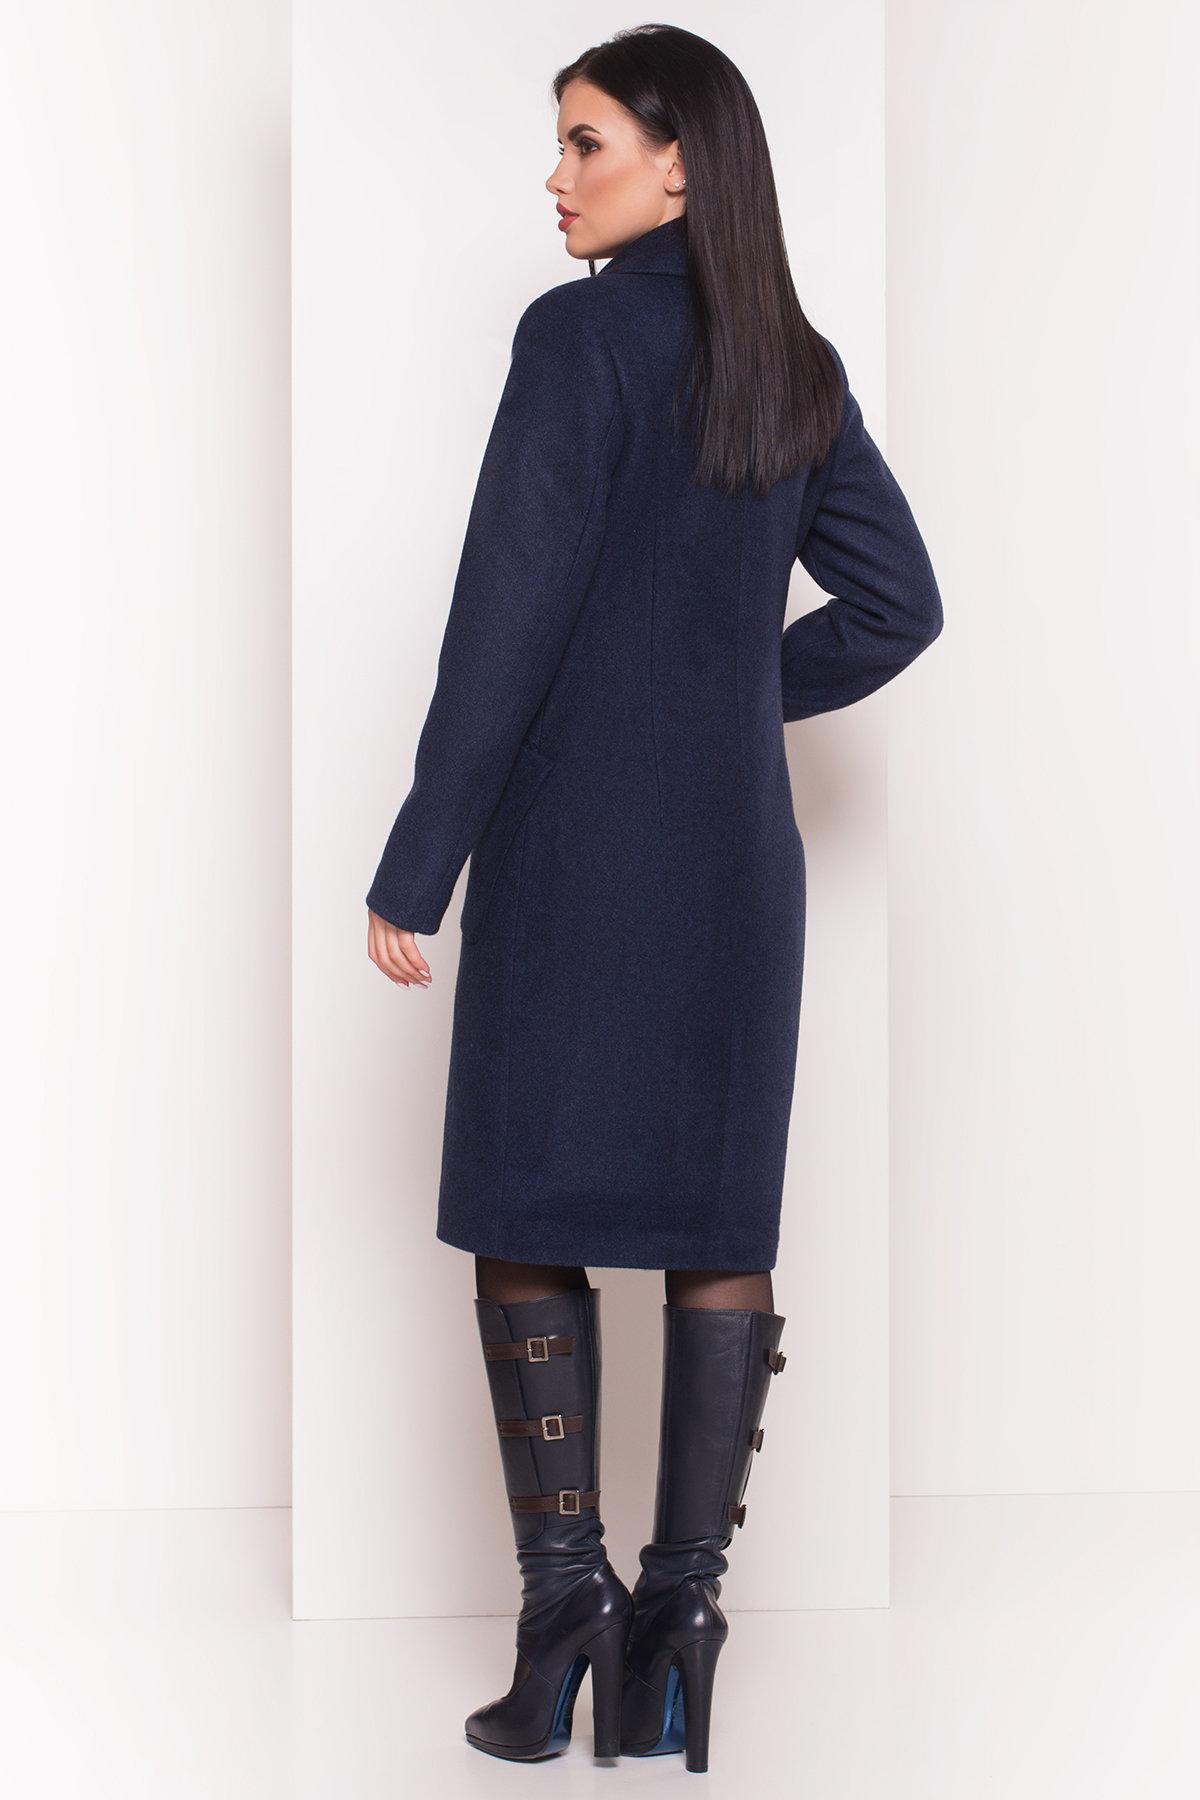 Пальто на весну-осень Габриэлла 4459 АРТ. 36662 Цвет: Темно-синий 17 - фото 2, интернет магазин tm-modus.ru